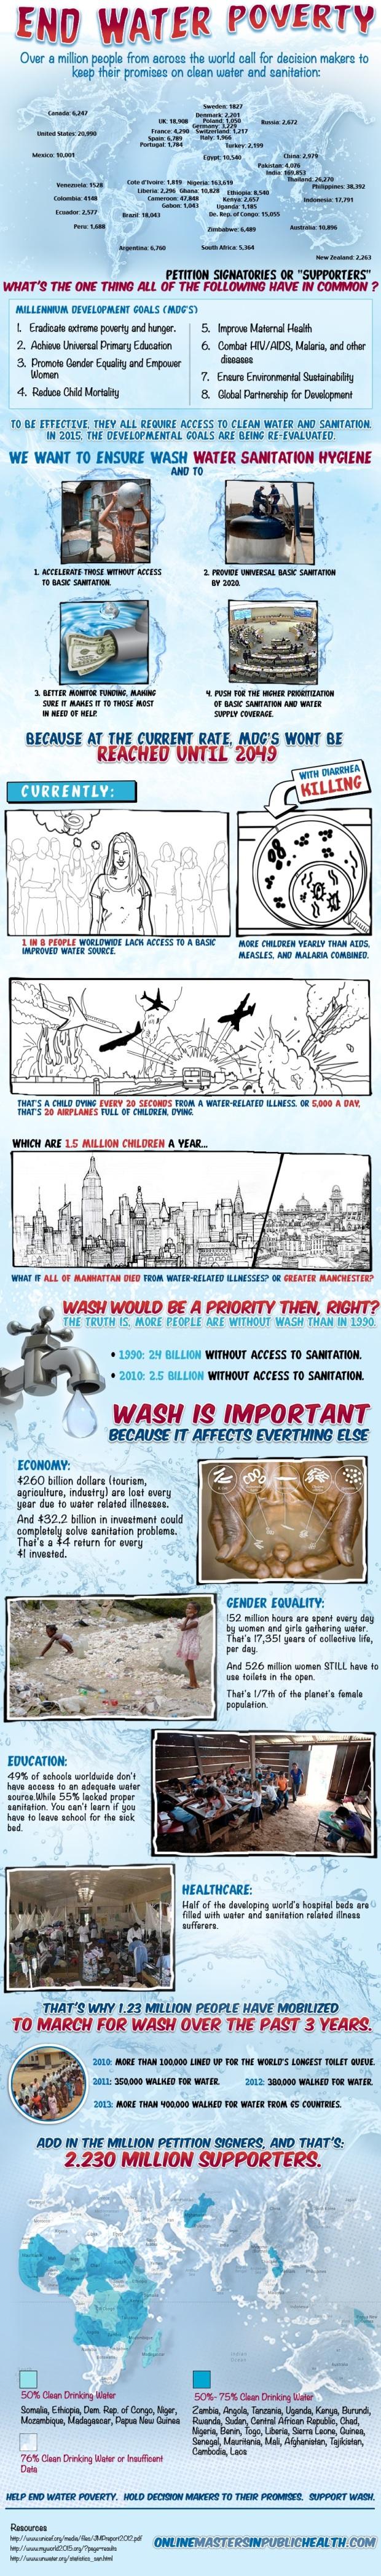 end-water-poverty_5262f13e479ea